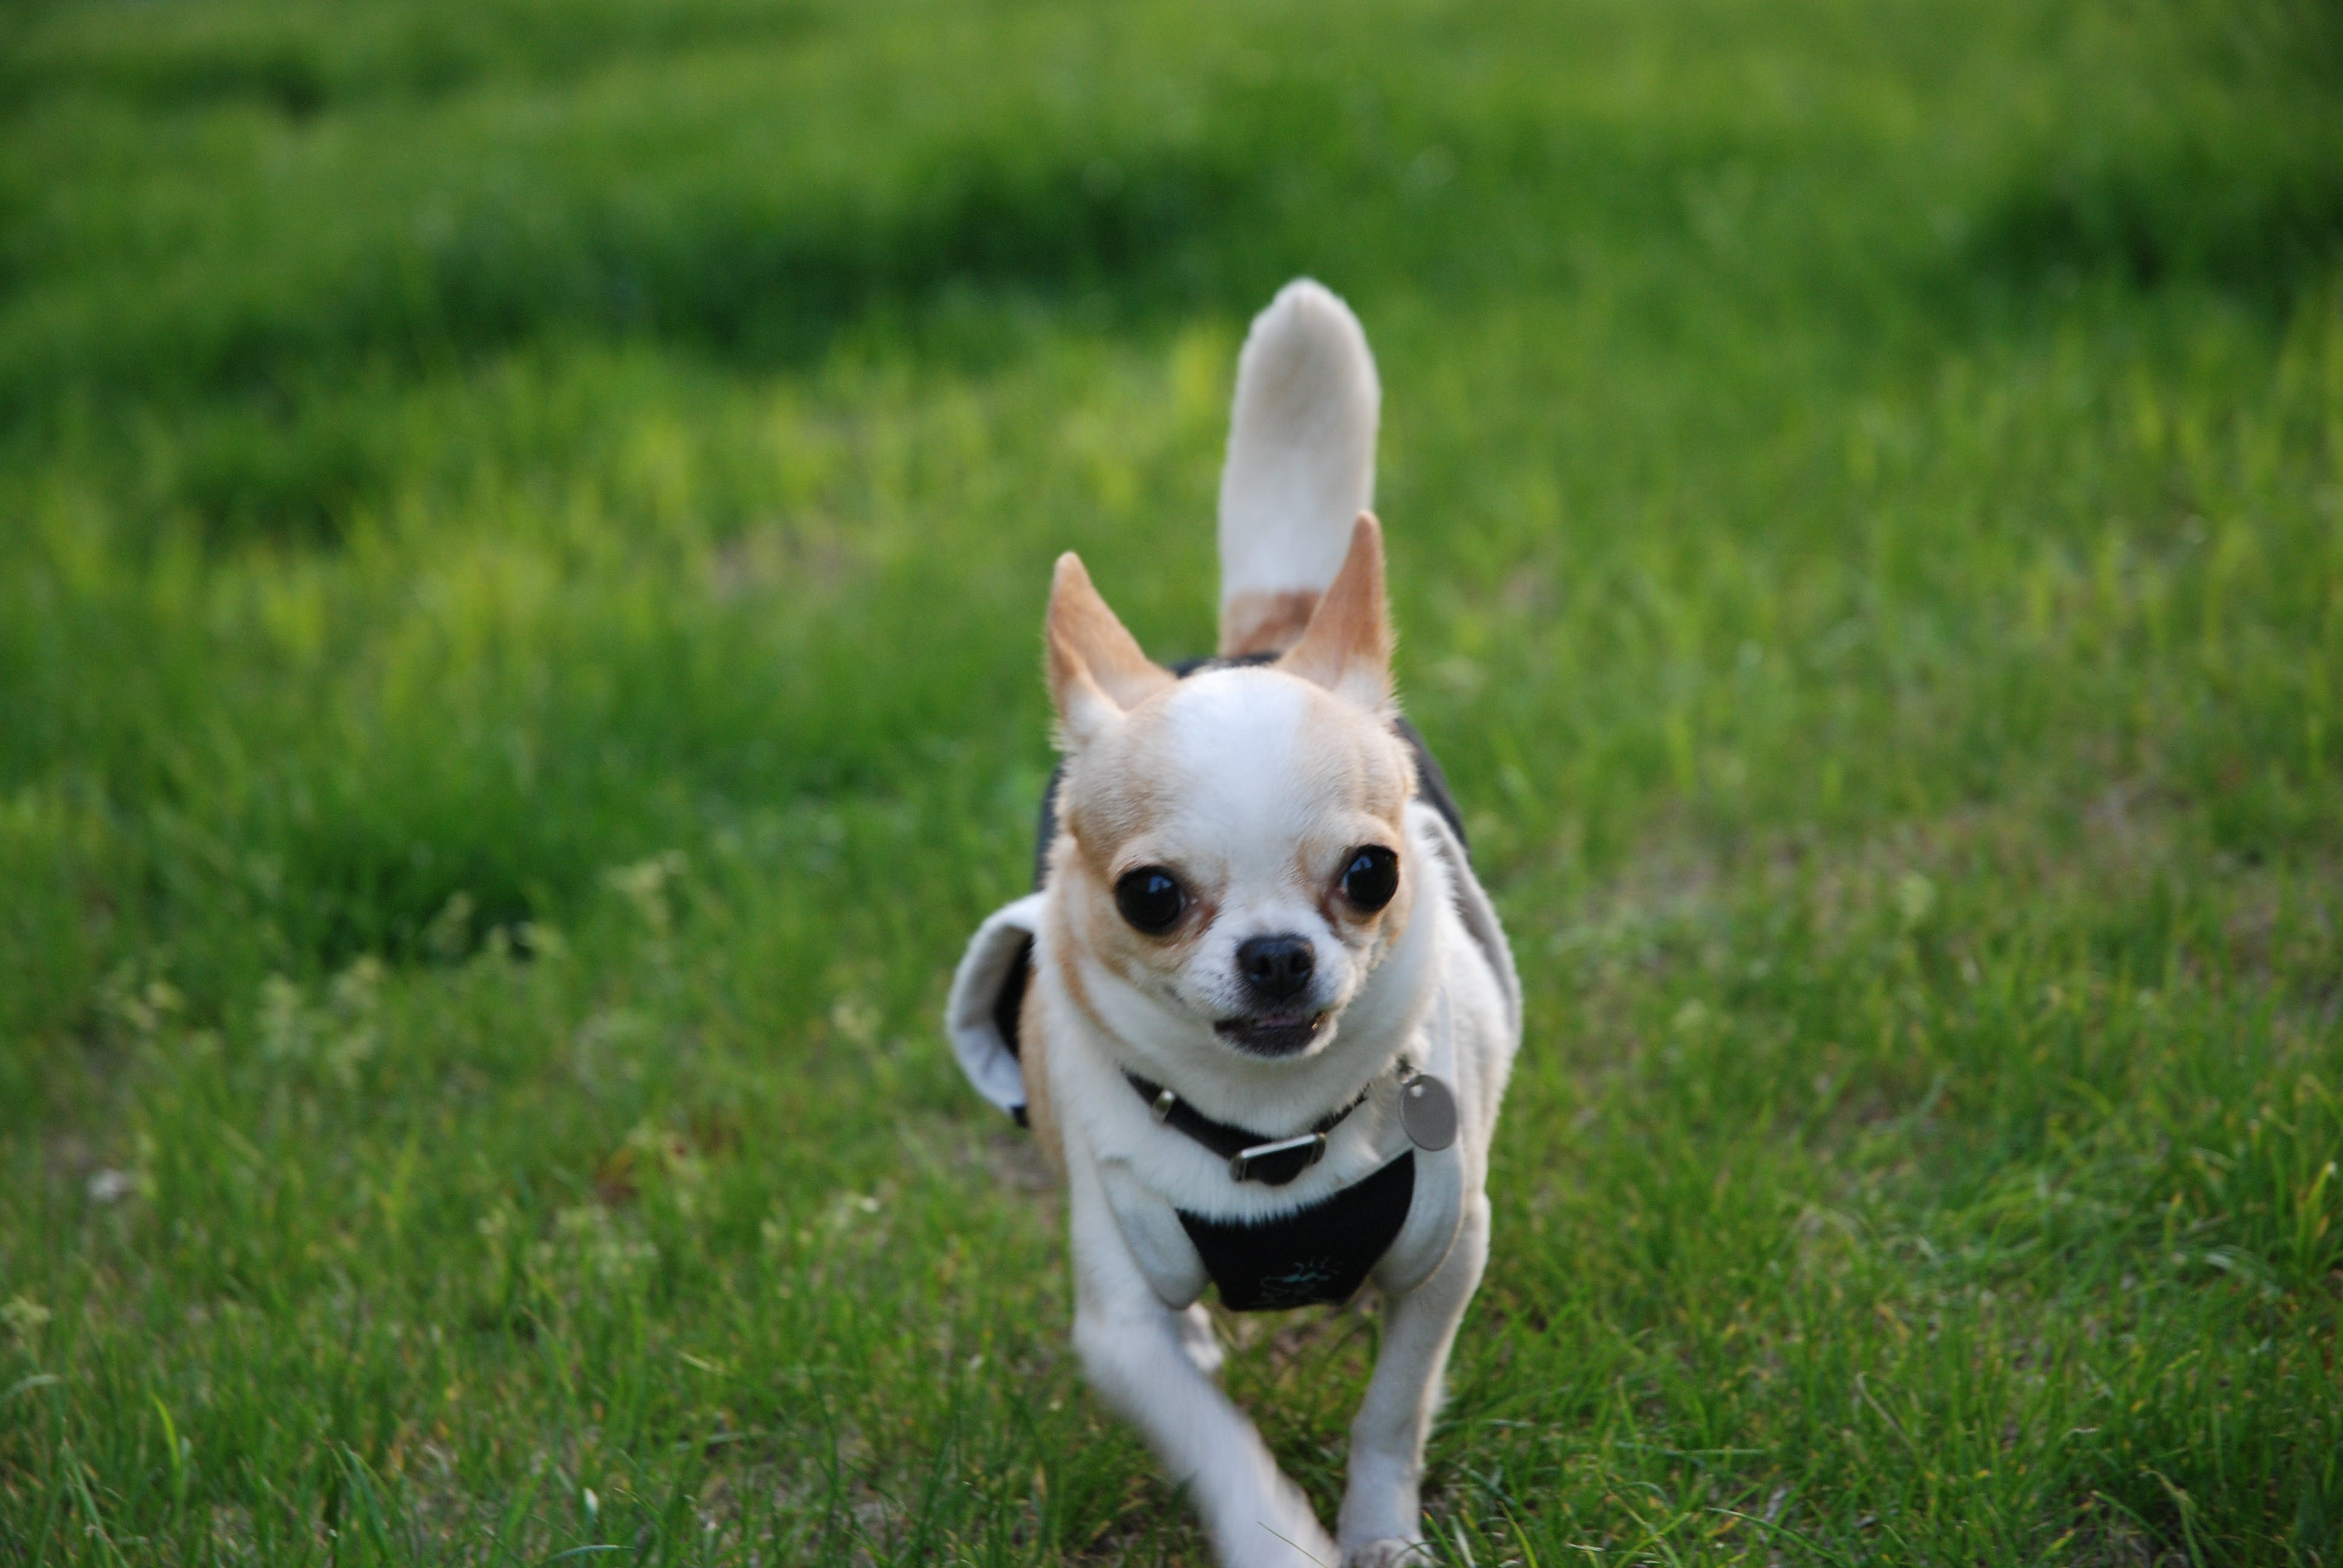 Gratis lagerfoto af chihuahua, hund